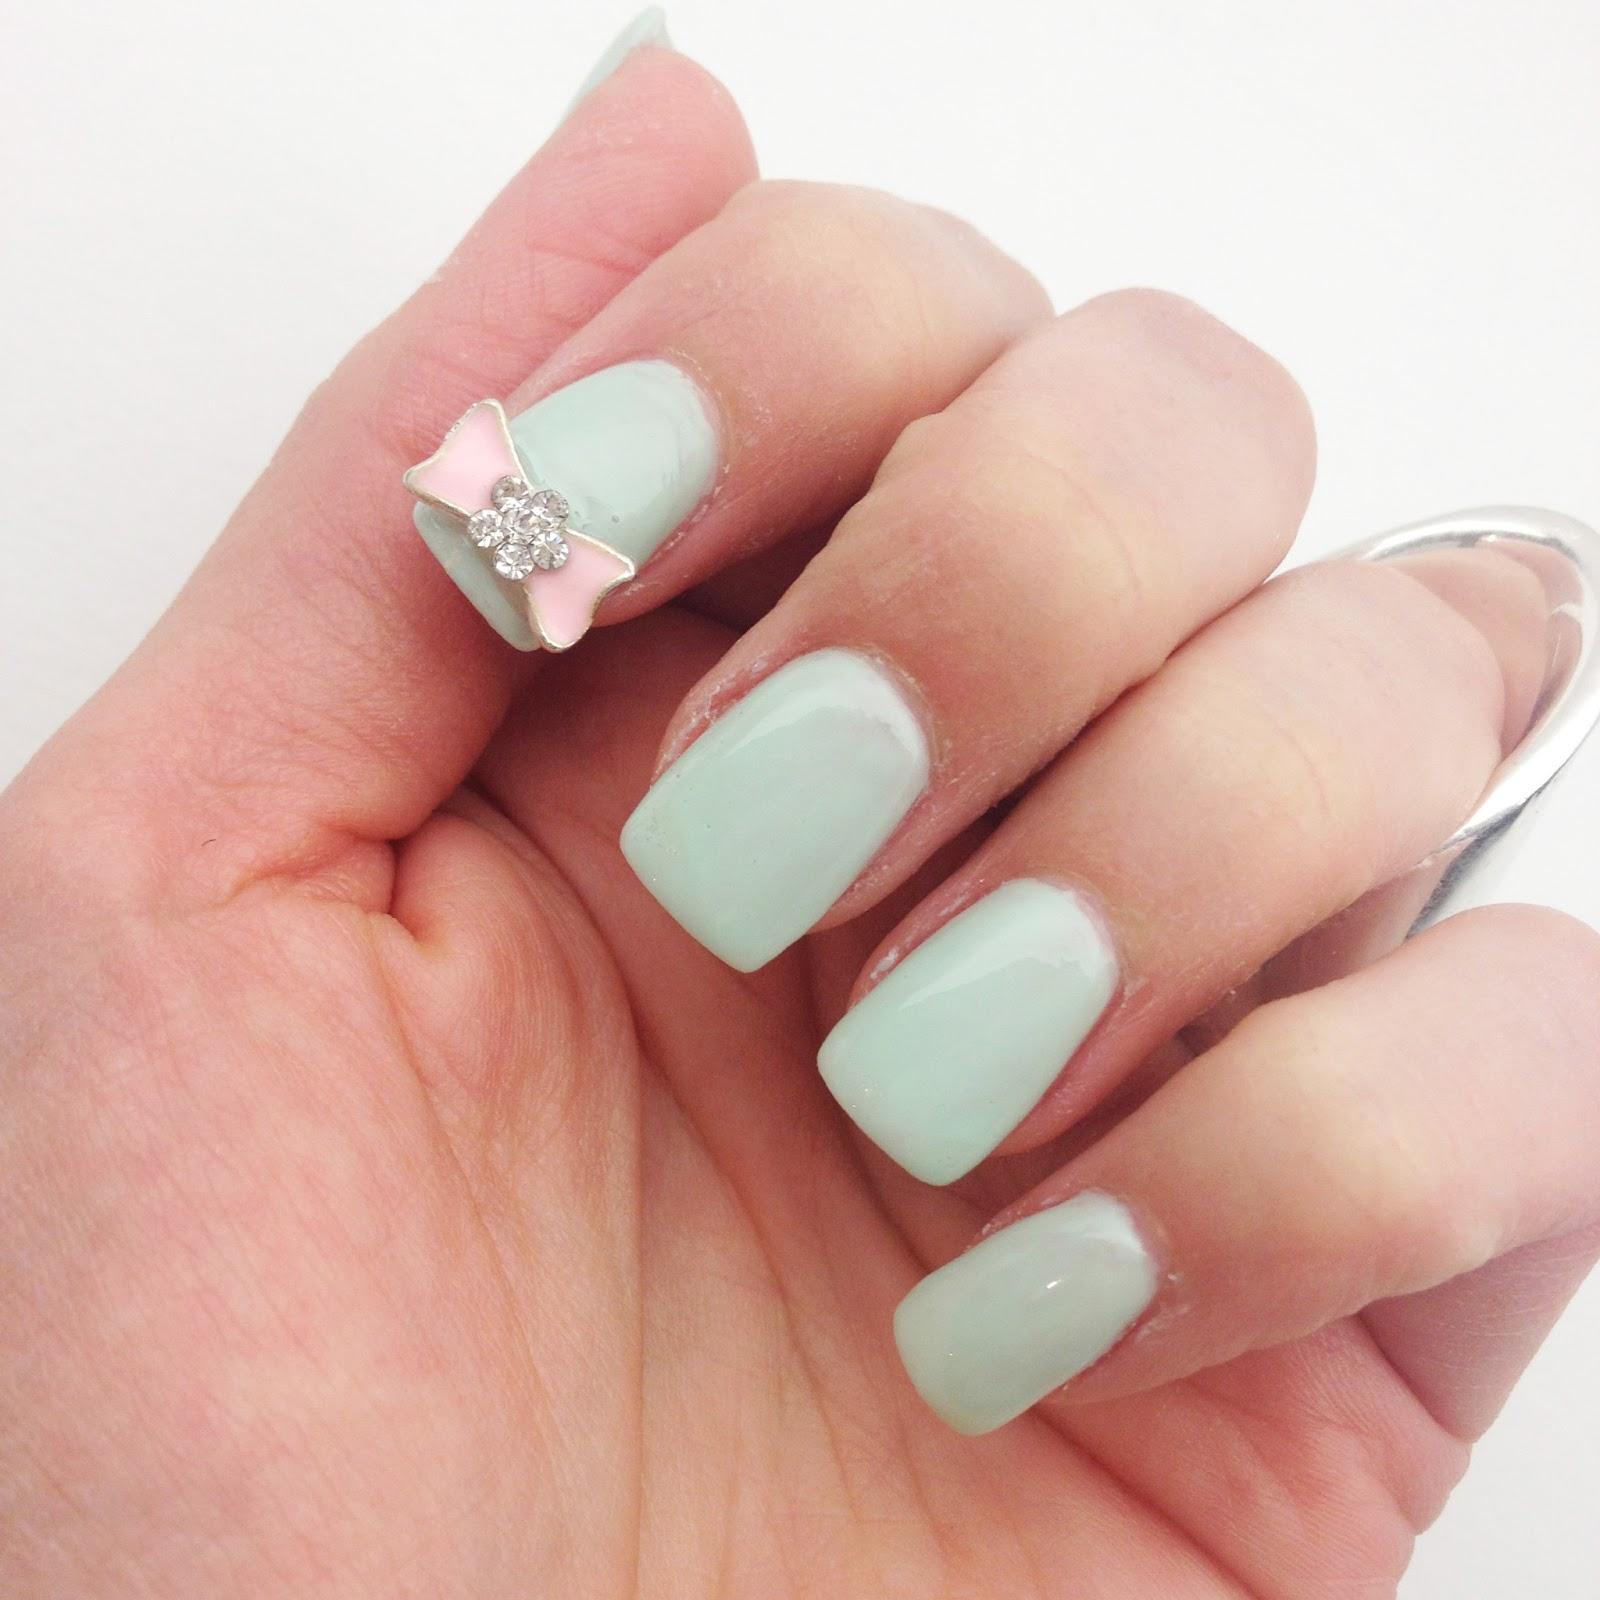 Pretty Nail Art: Kandeej.com: Cute Bow Nails ...like An Ice Cream Parlor